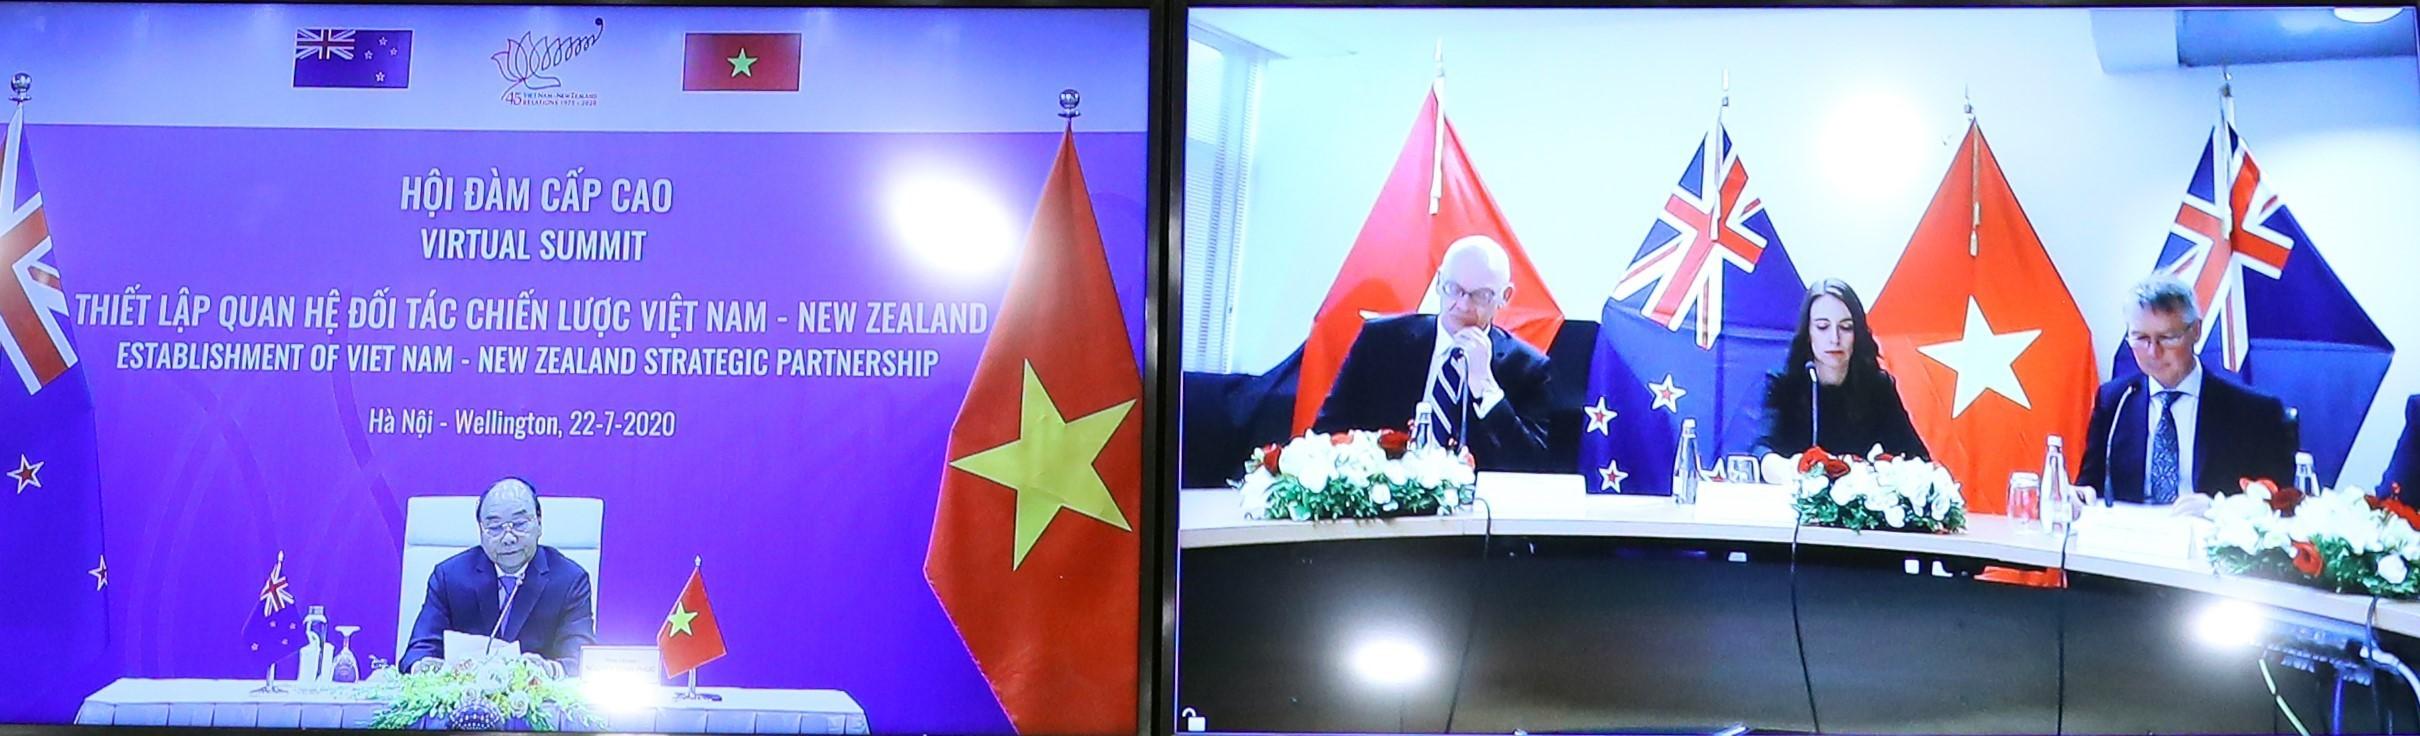 Vietnam, New Zealand elevate ties to strategic partnership